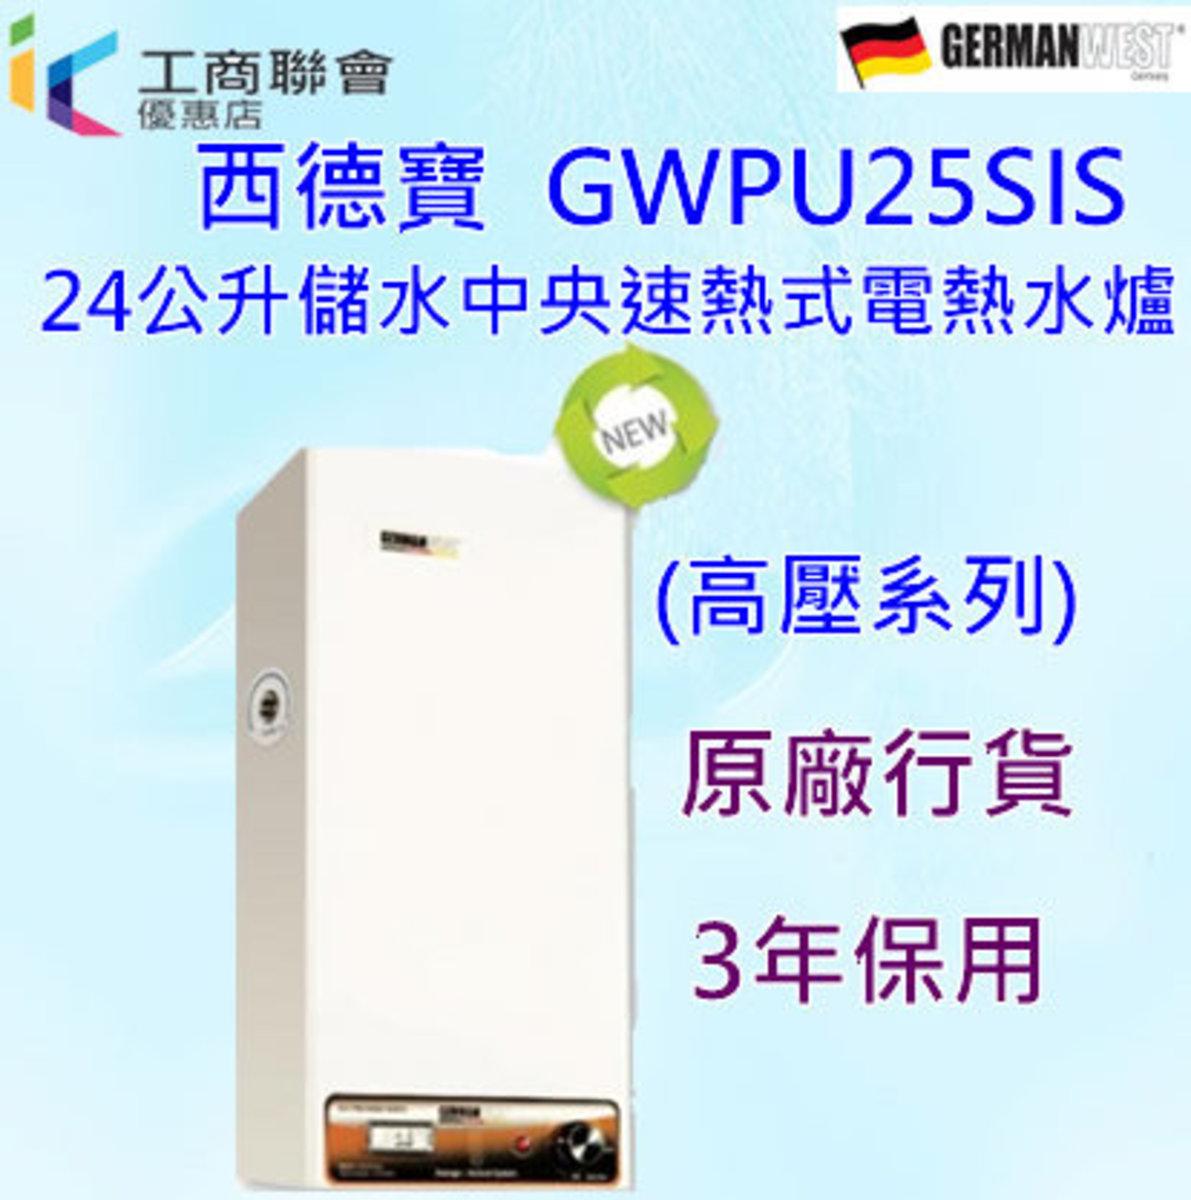 GERMAN WEST    GWPU25SIS   24公升儲水中央速熱式電熱水爐